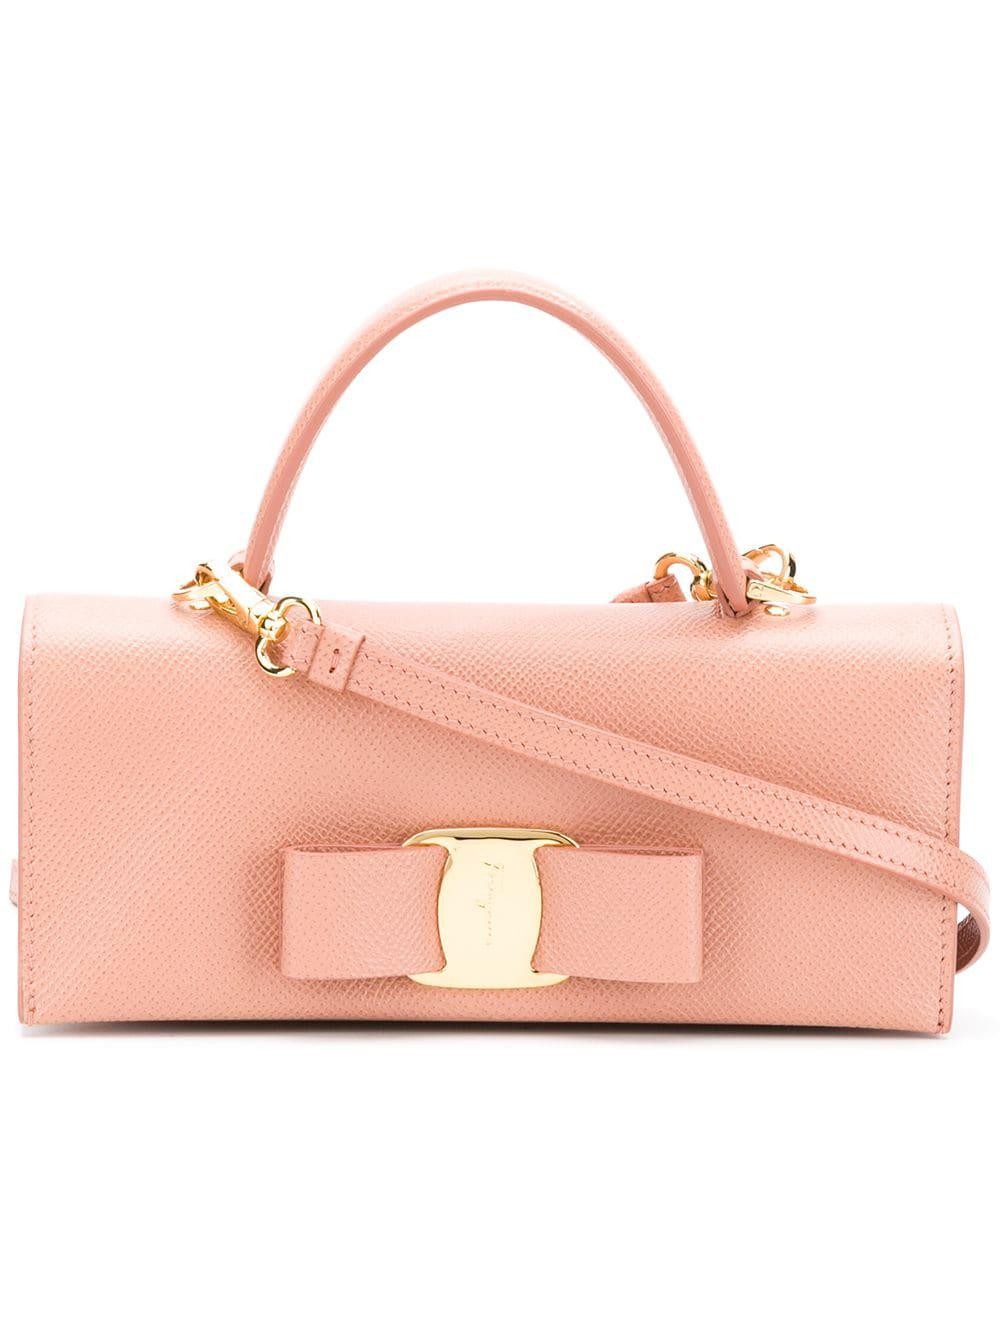 bf3c2d57e4 Ferragamo Vara Leather Clutch in Pink - Lyst